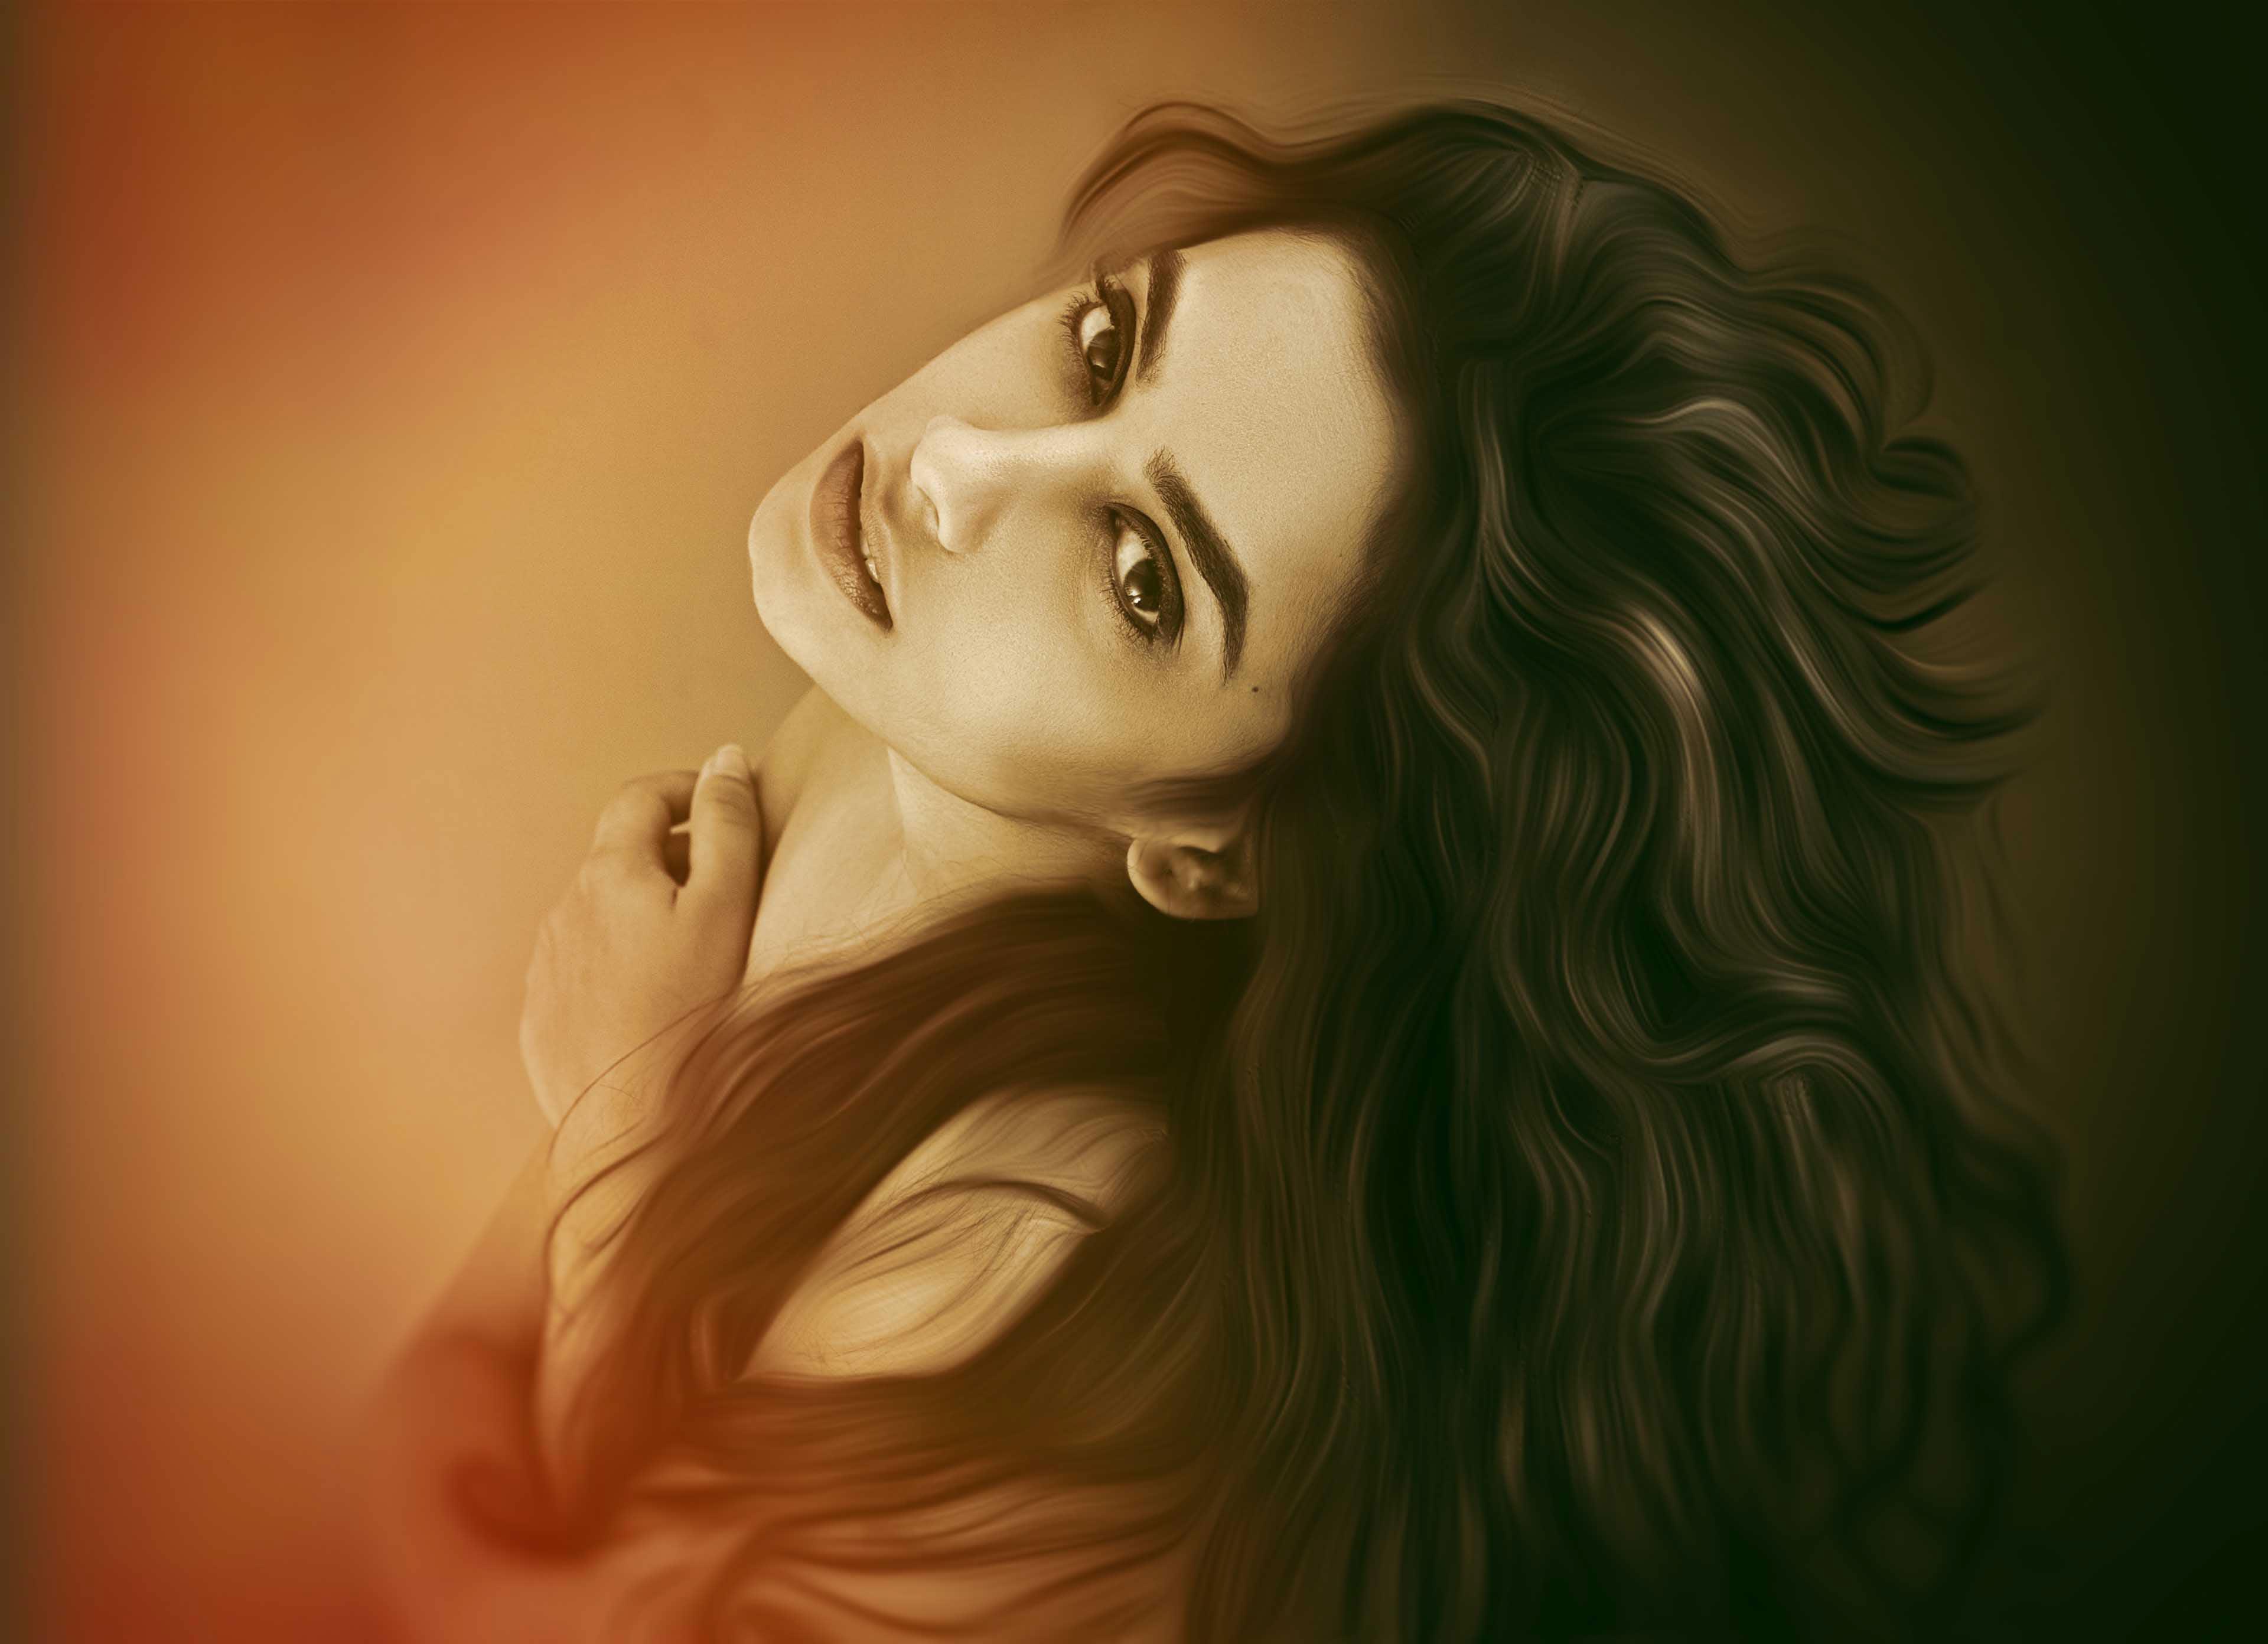 Beautiful Girl Wallpaper Hd 4k - HD Wallpaper